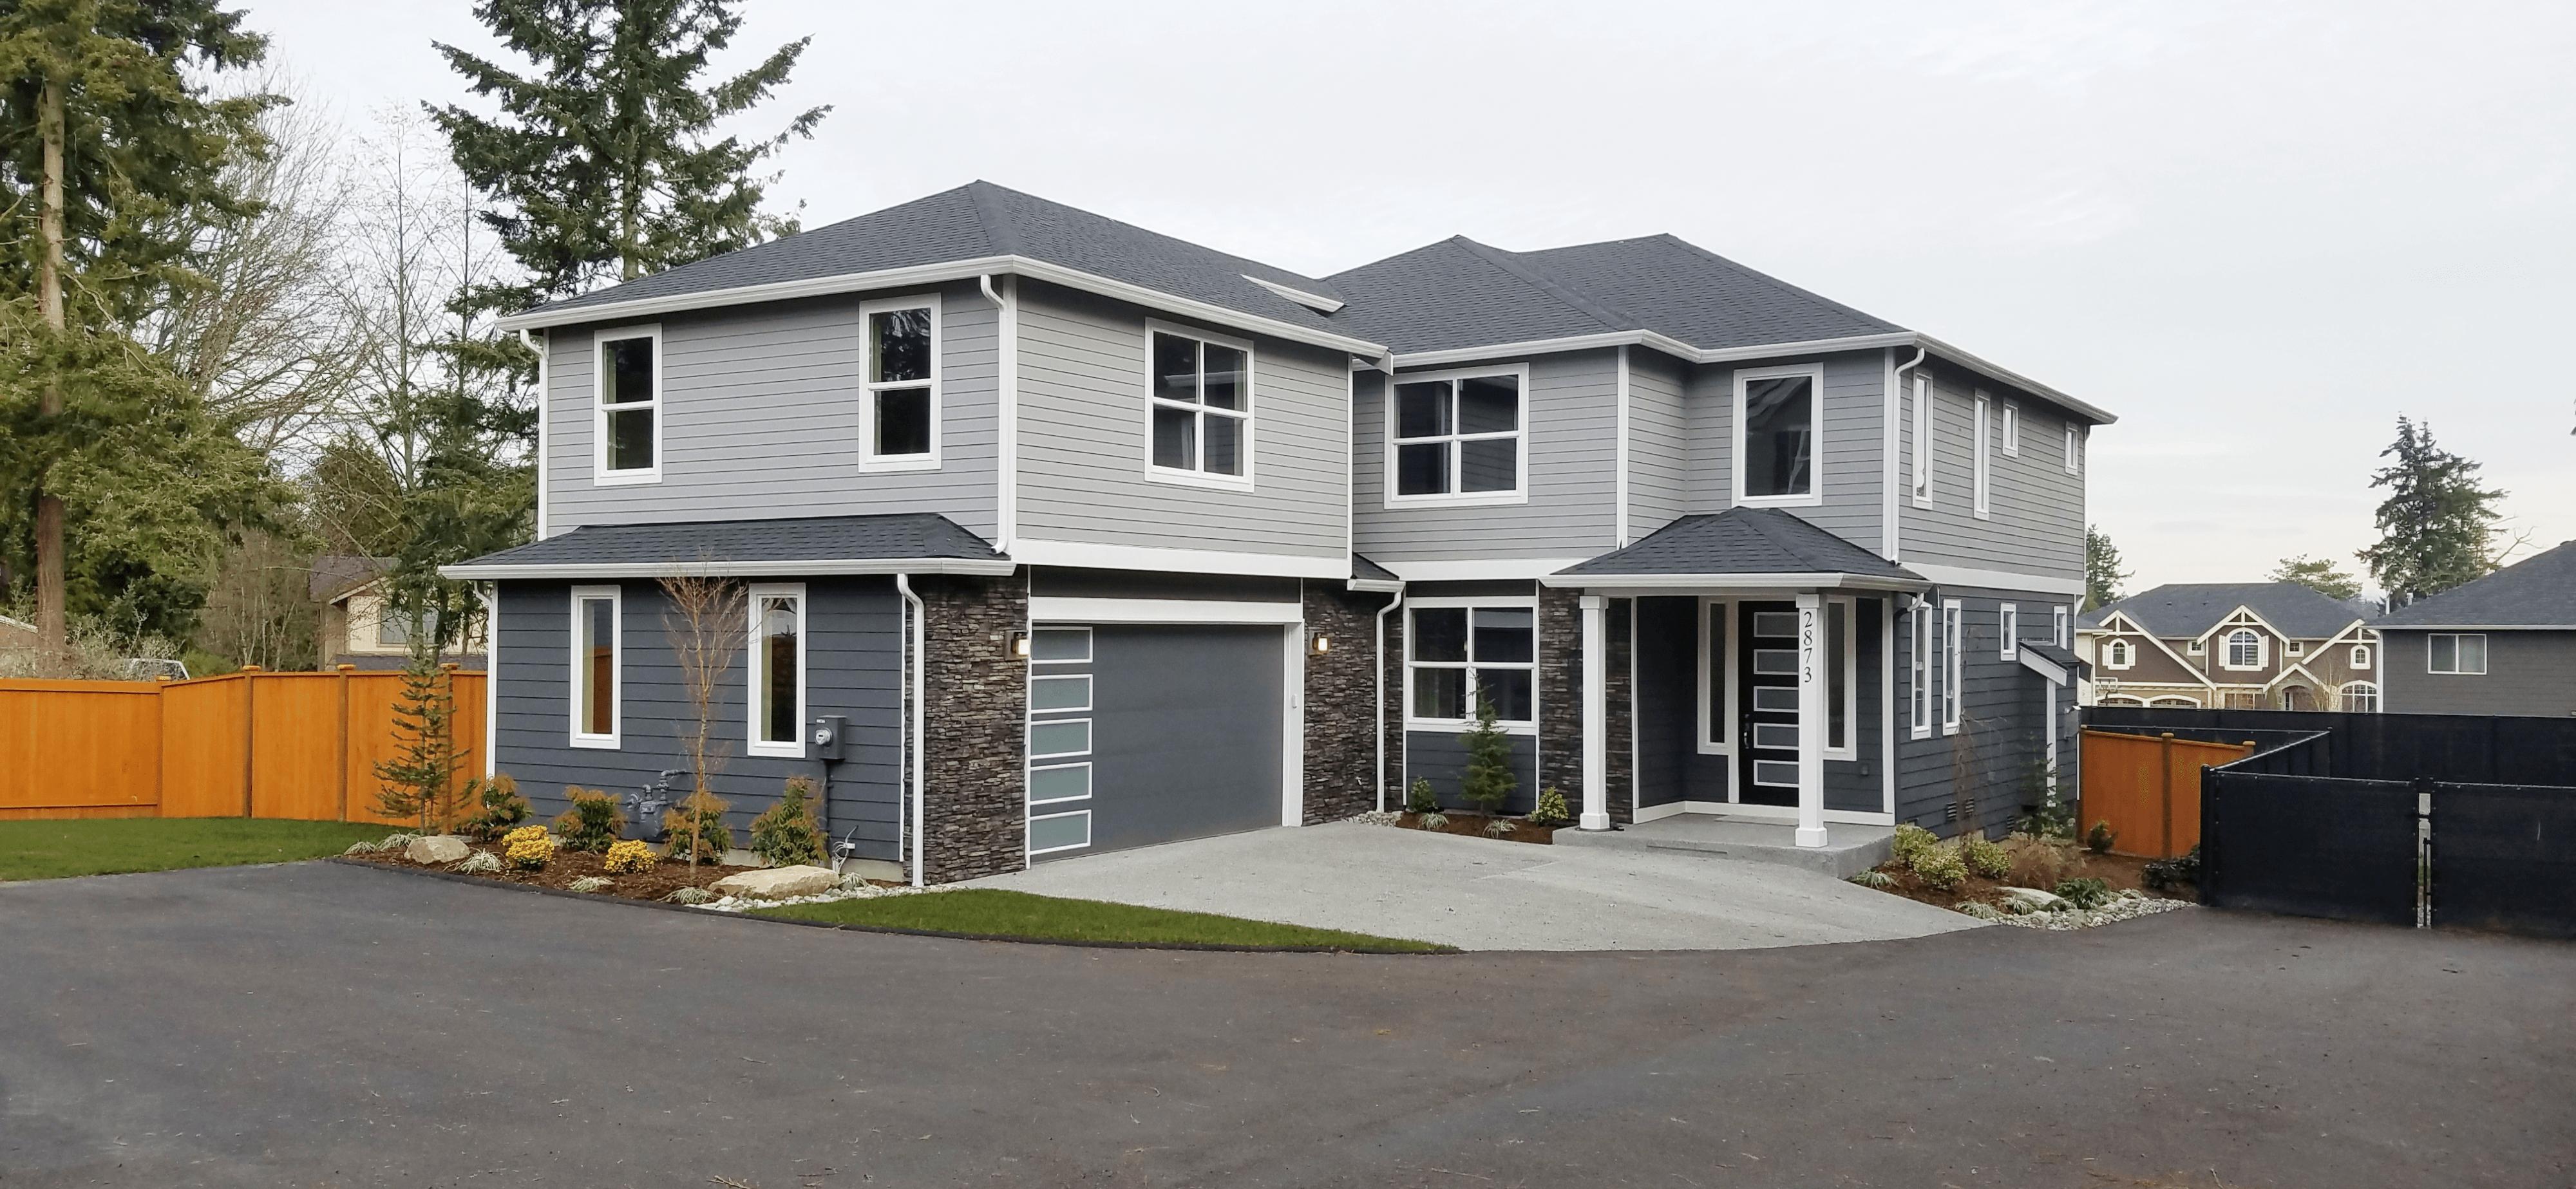 New Construction Homes Plans In Mountlake Terrace Wa 1 756